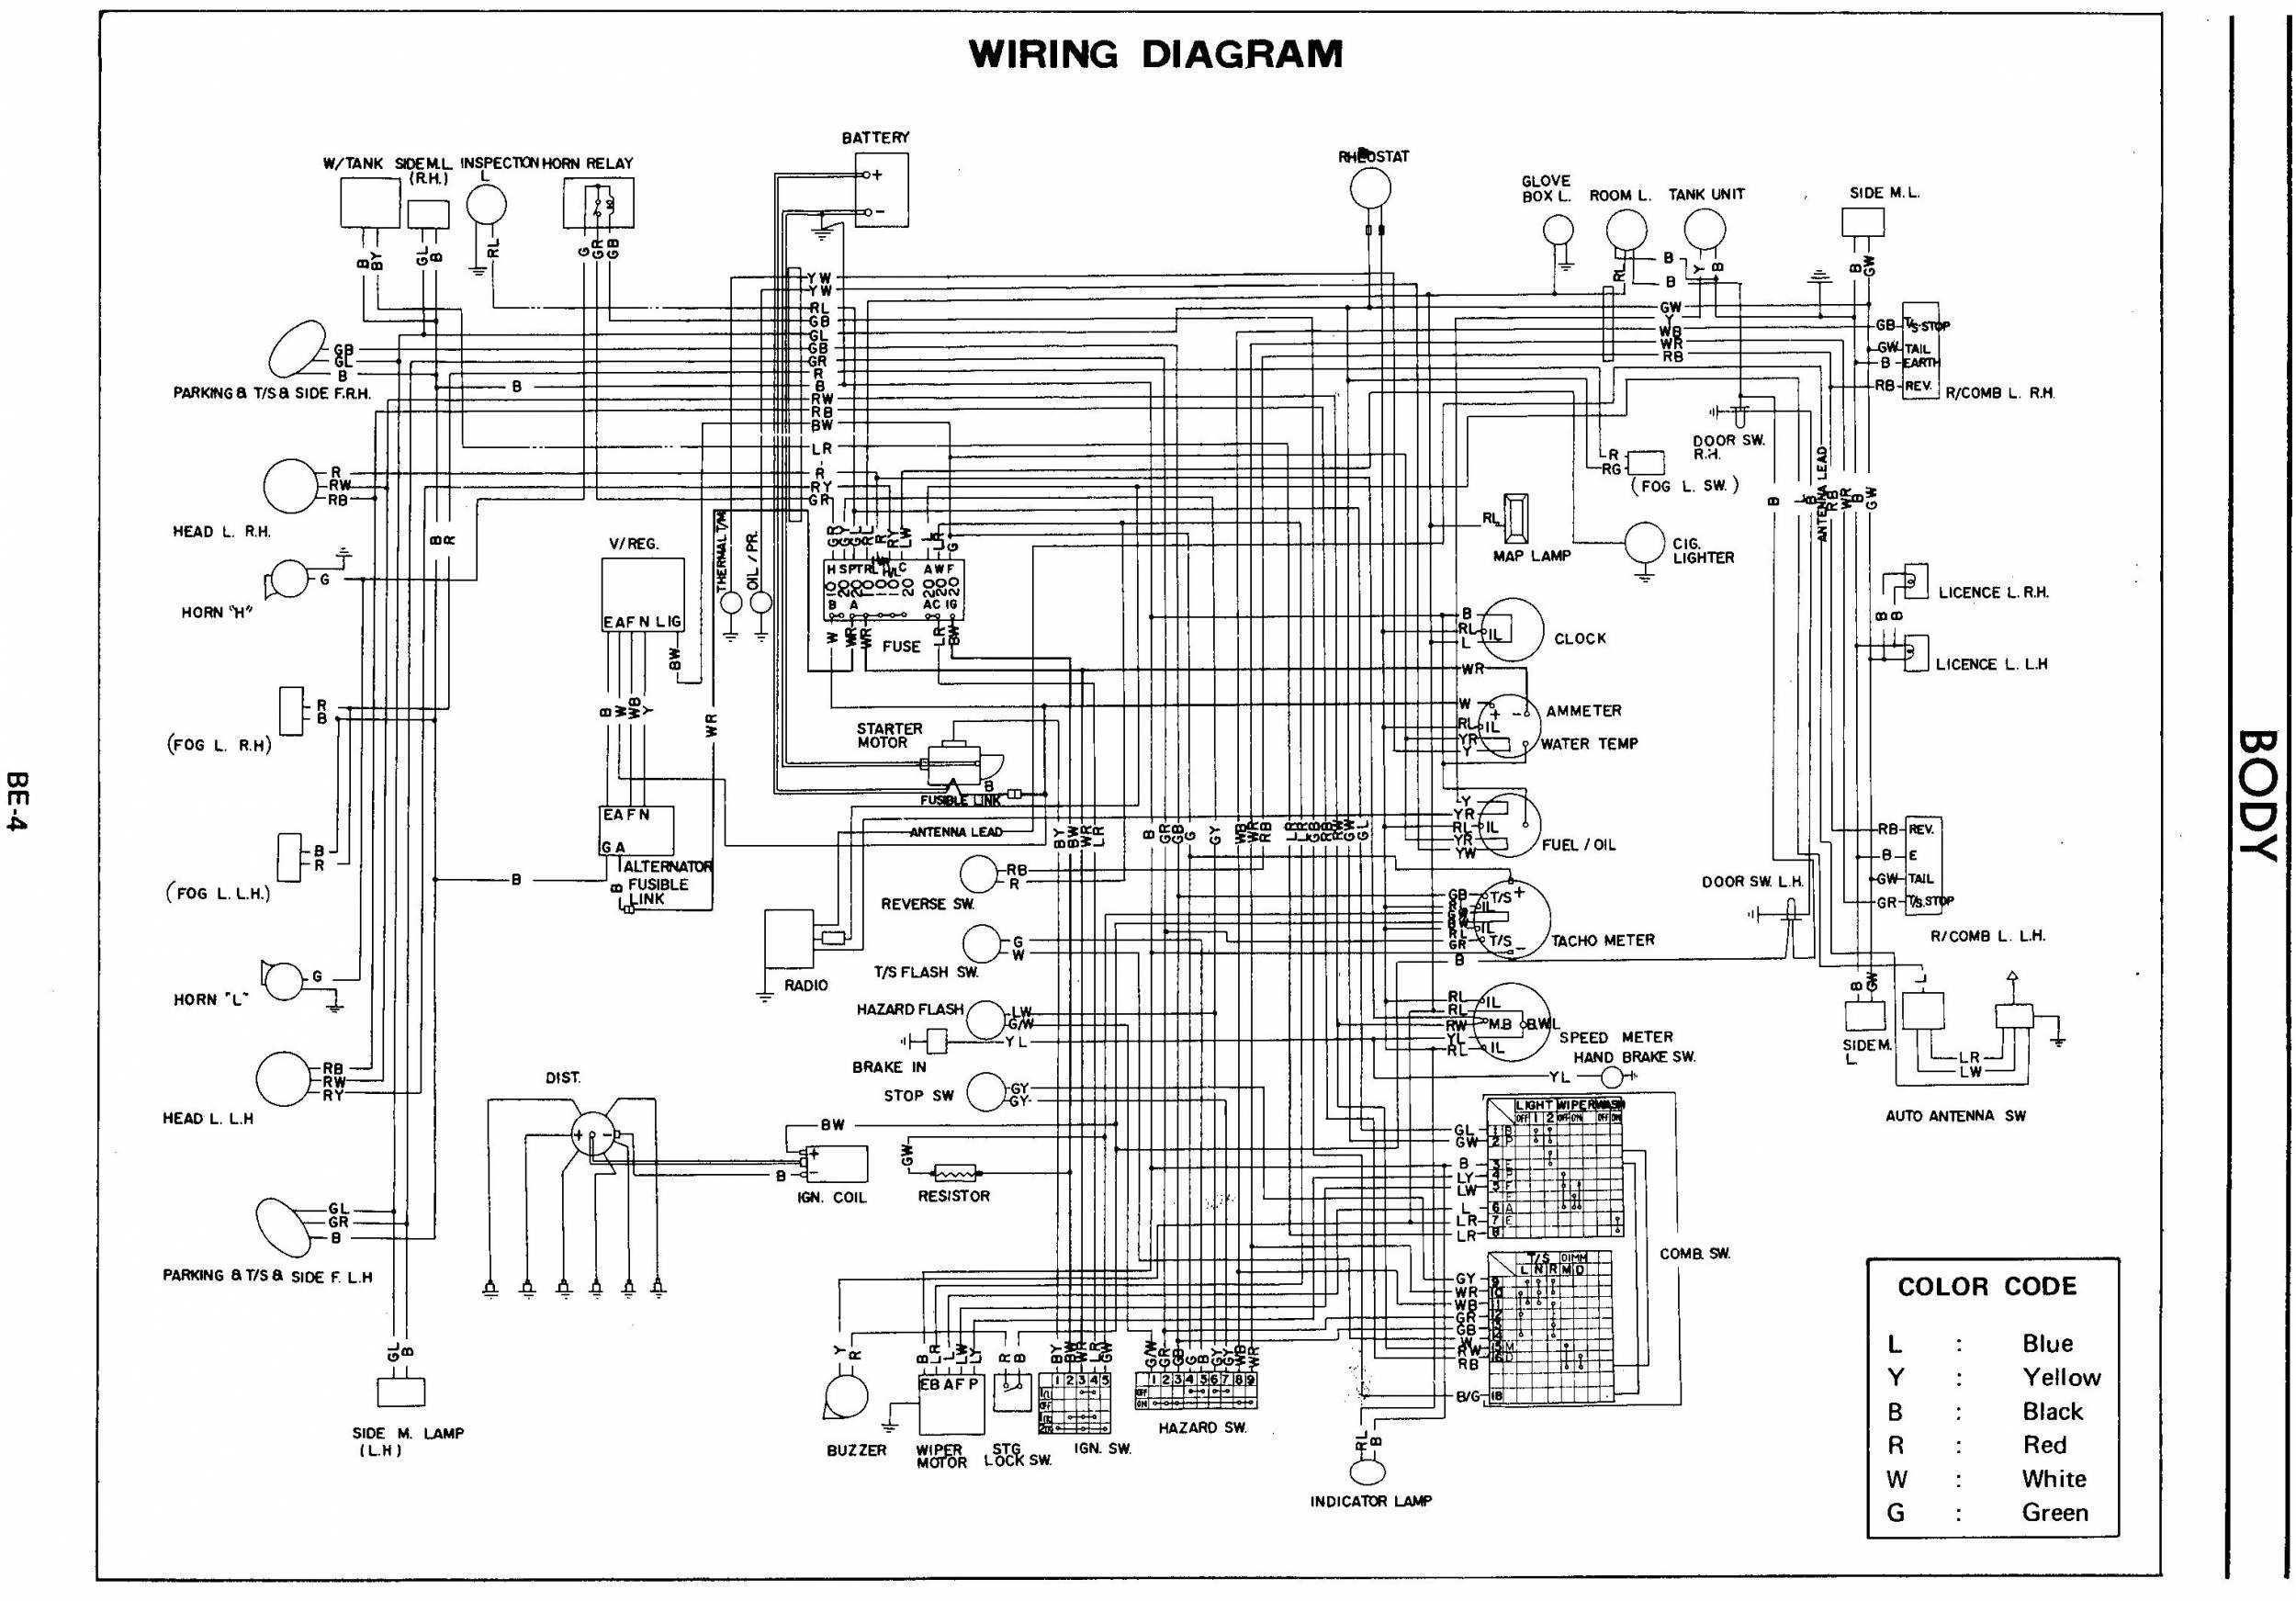 1974 Mercedes Benz Wiring Diagrams Bmw E90 Wiring Diagrams Online Begeboy Wiring Diagram Source